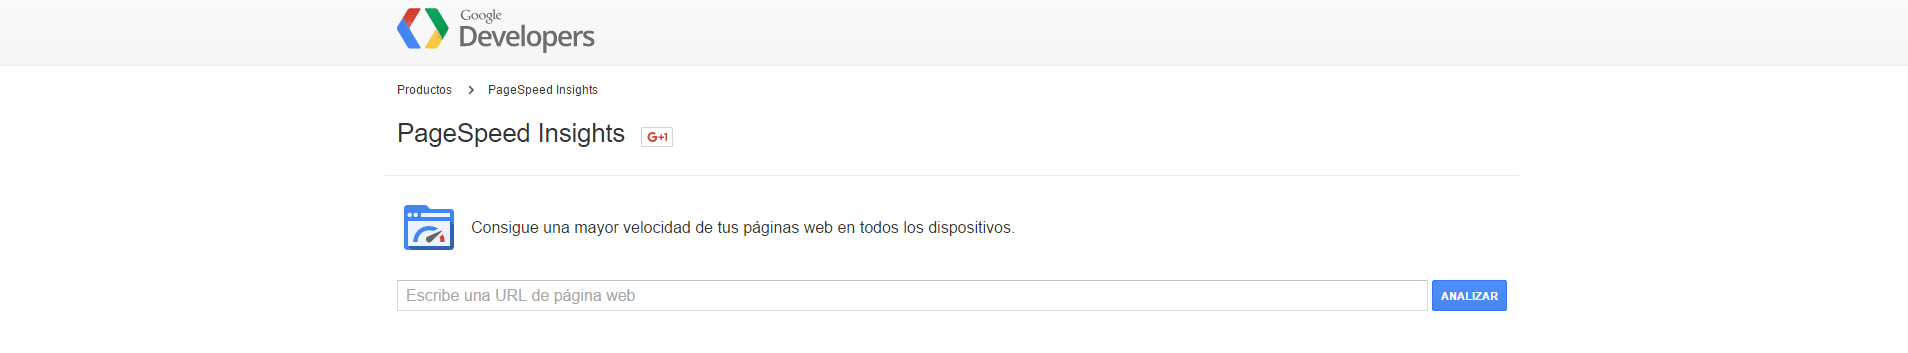 google-developer-time